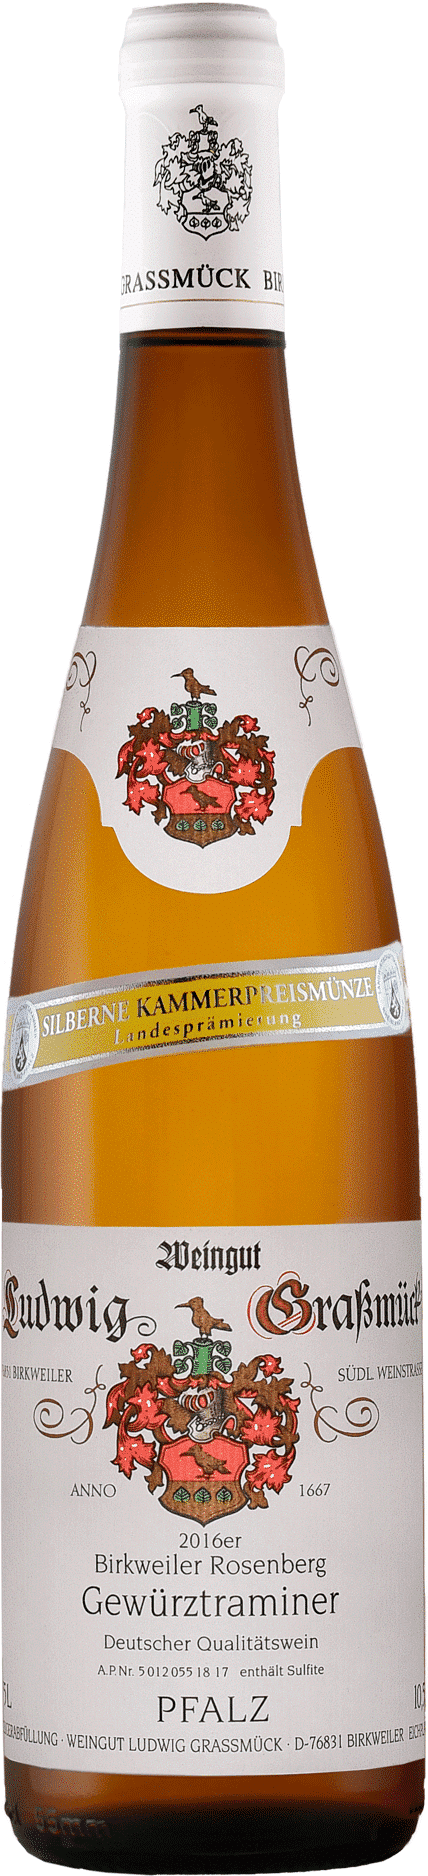 Weingut Ludwig Graßmück, Simon Graßmück, Gewürztraminer